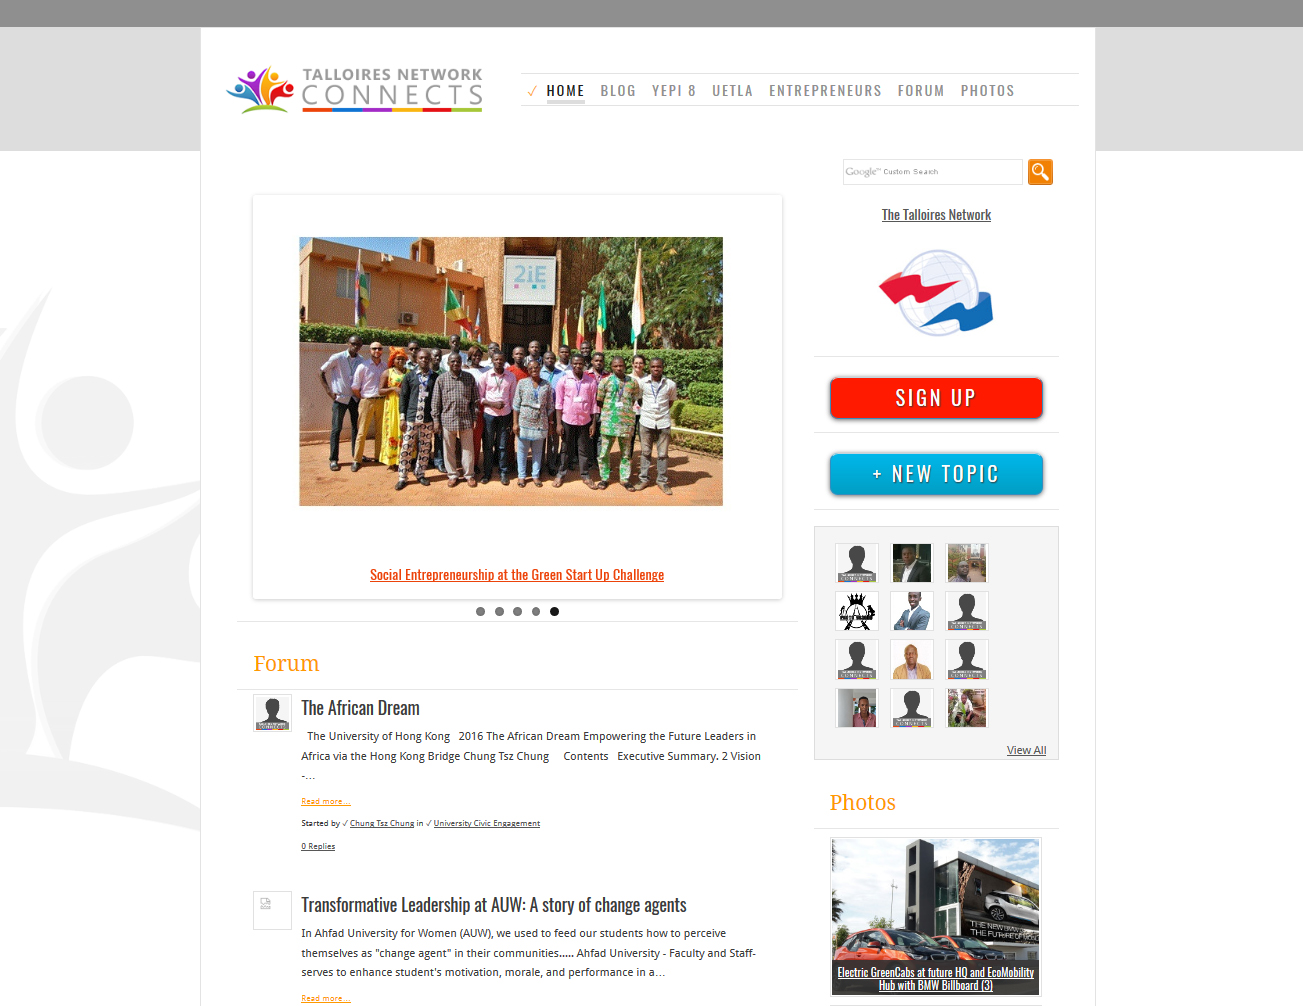 Talloires Network (TUFTS University) - Ning platform 3.0